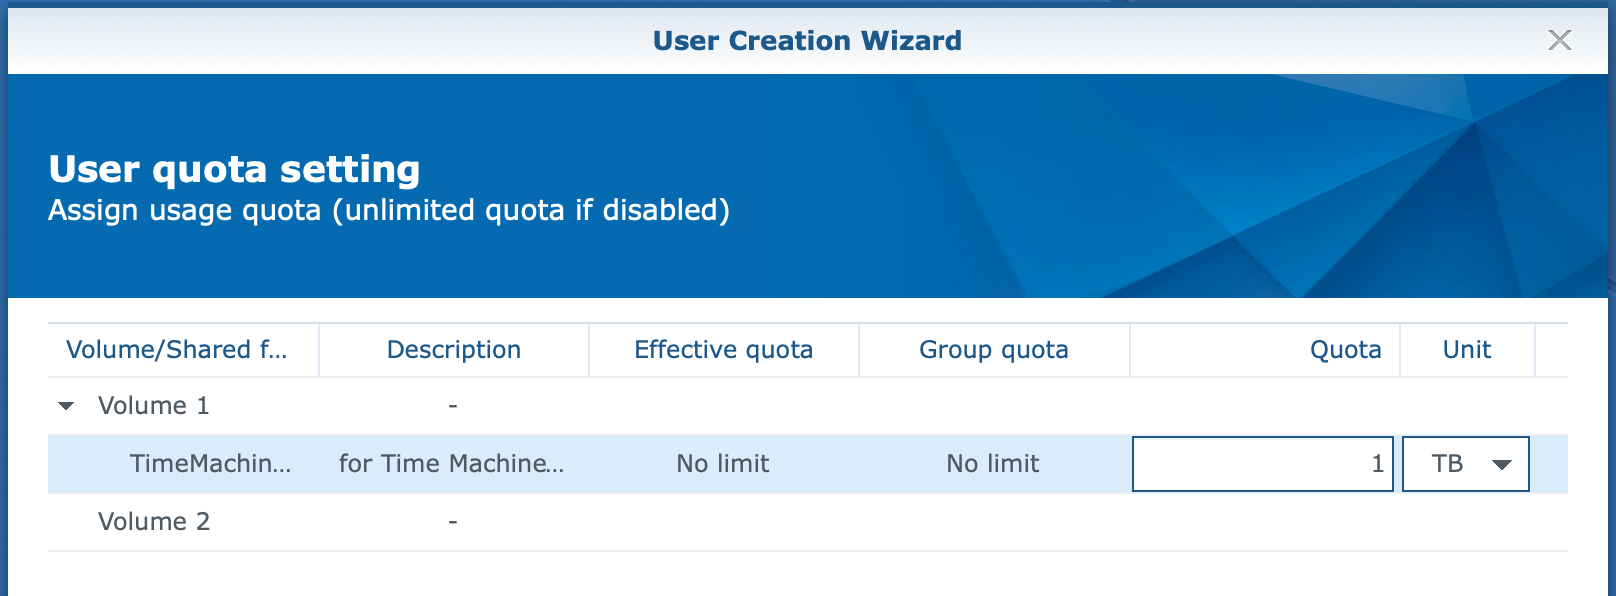 synology, user create wizard, user quota, dsm6